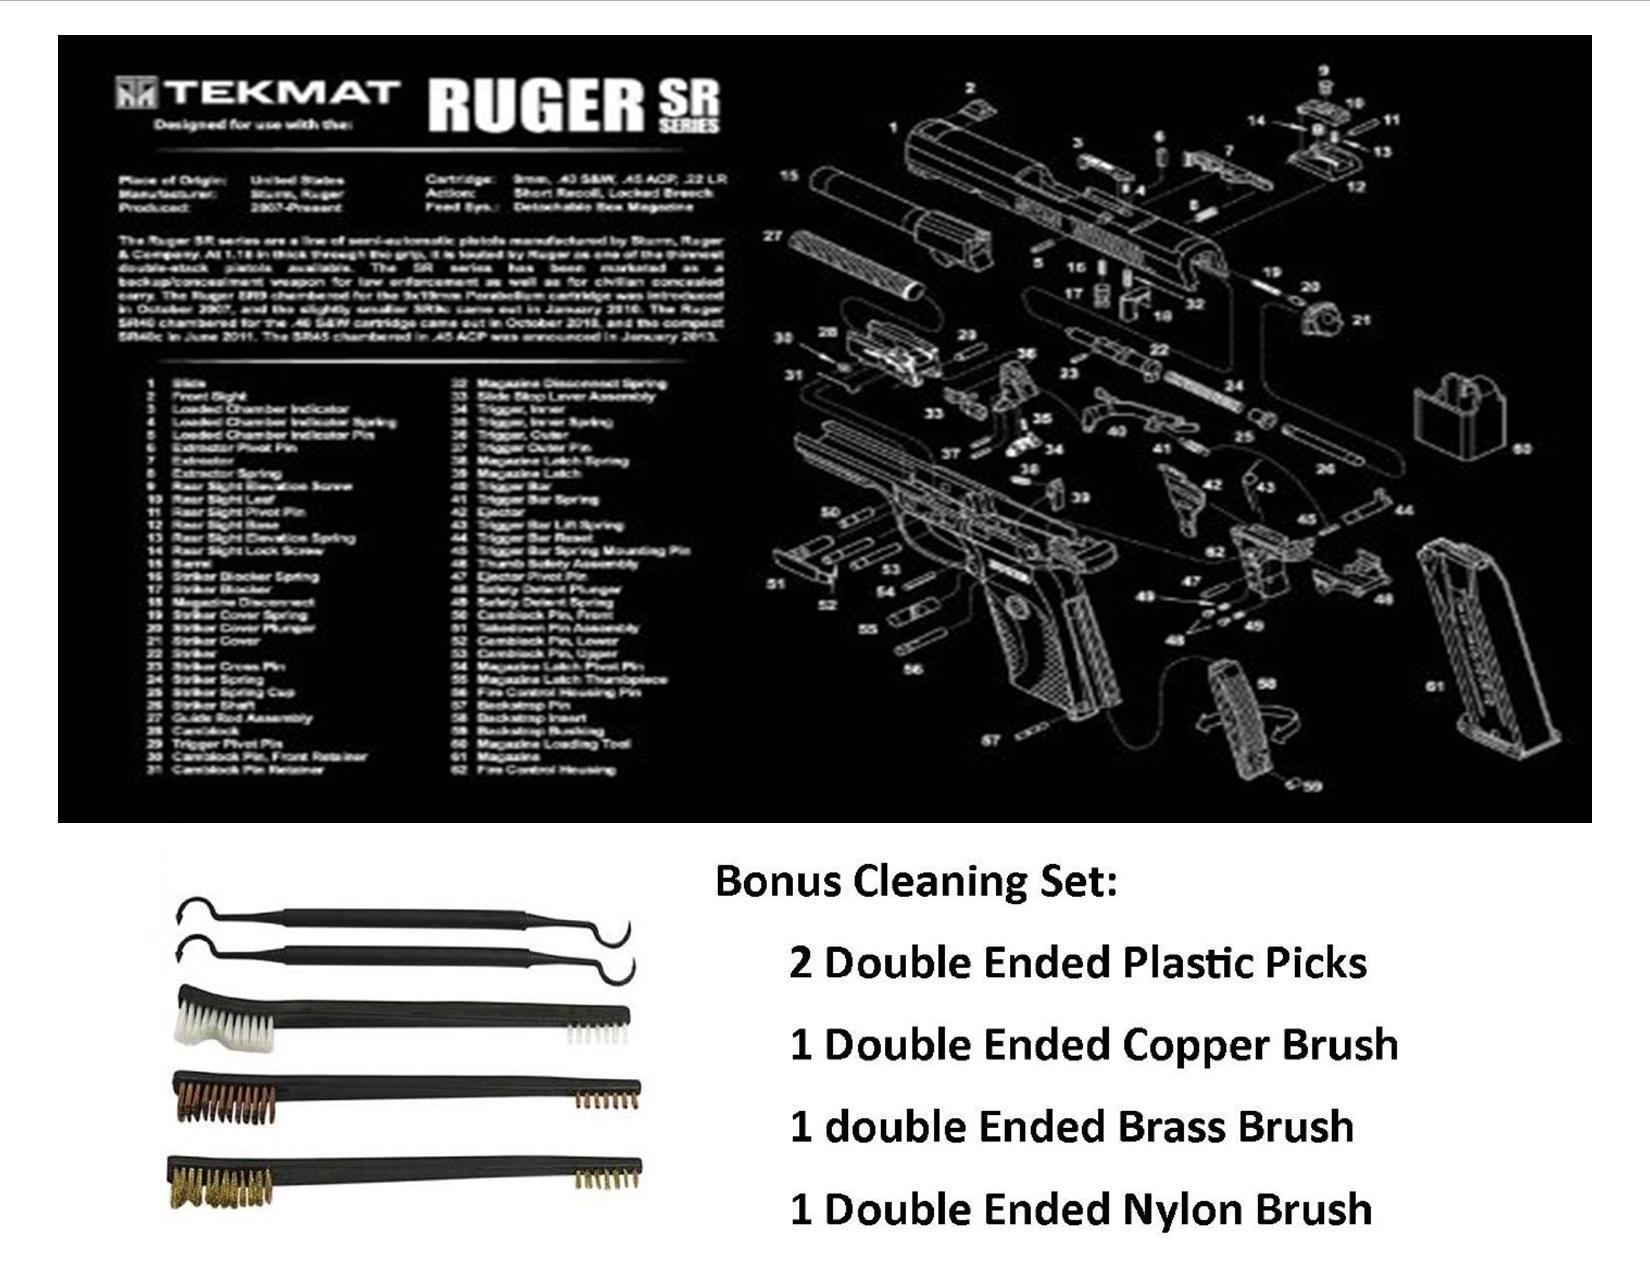 TekMat 11-Inch X 17-Inch Handgun Cleaning Mat with Ruger SR Imprint Bonus 5 oc Gun Cleaning Brush & Pick Set